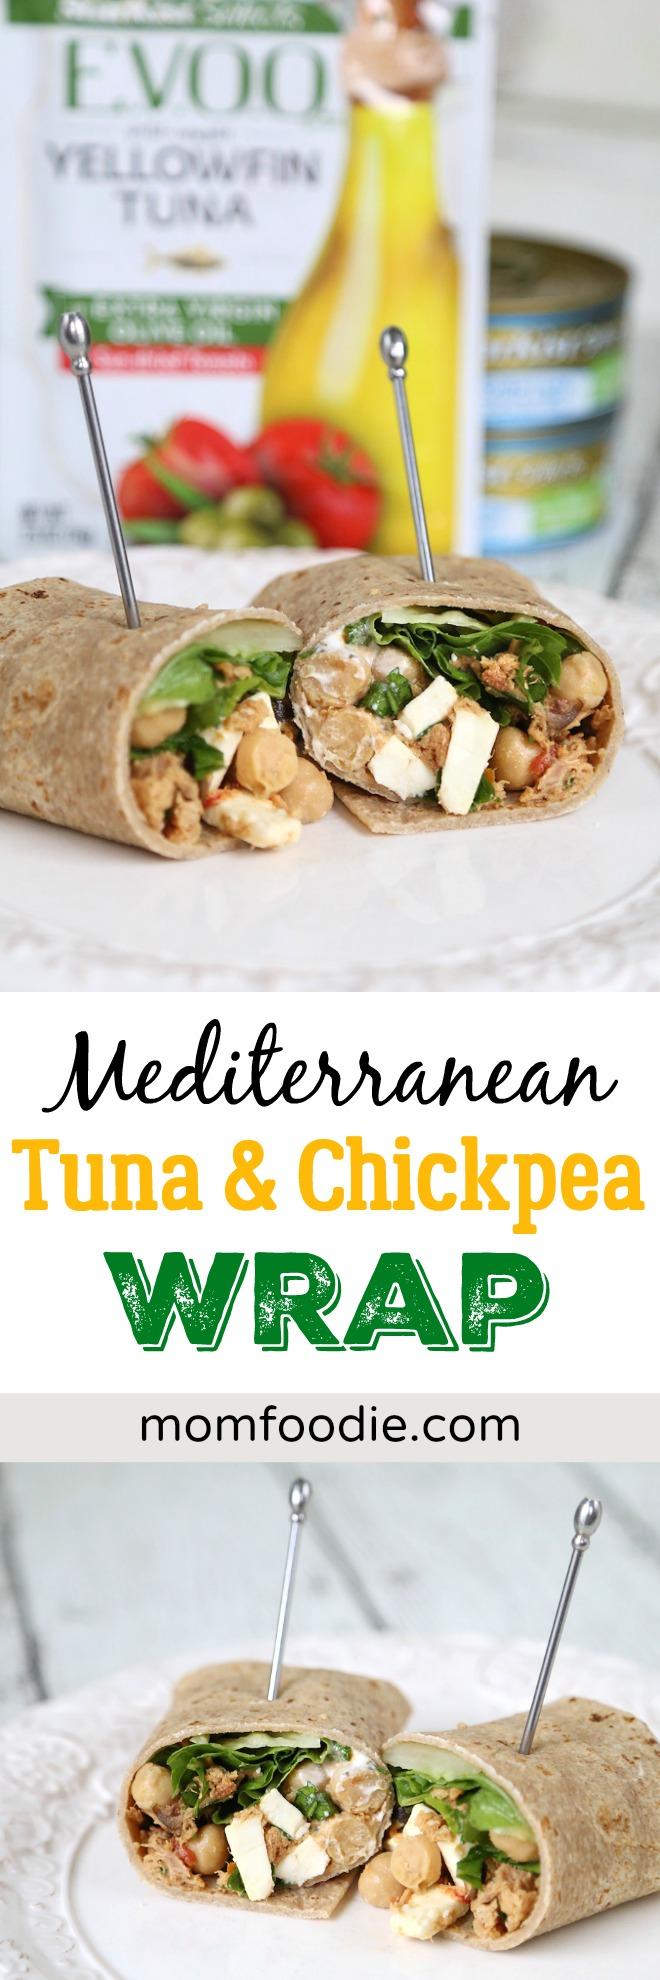 Mediterranean Tuna & Chickpea Wrap